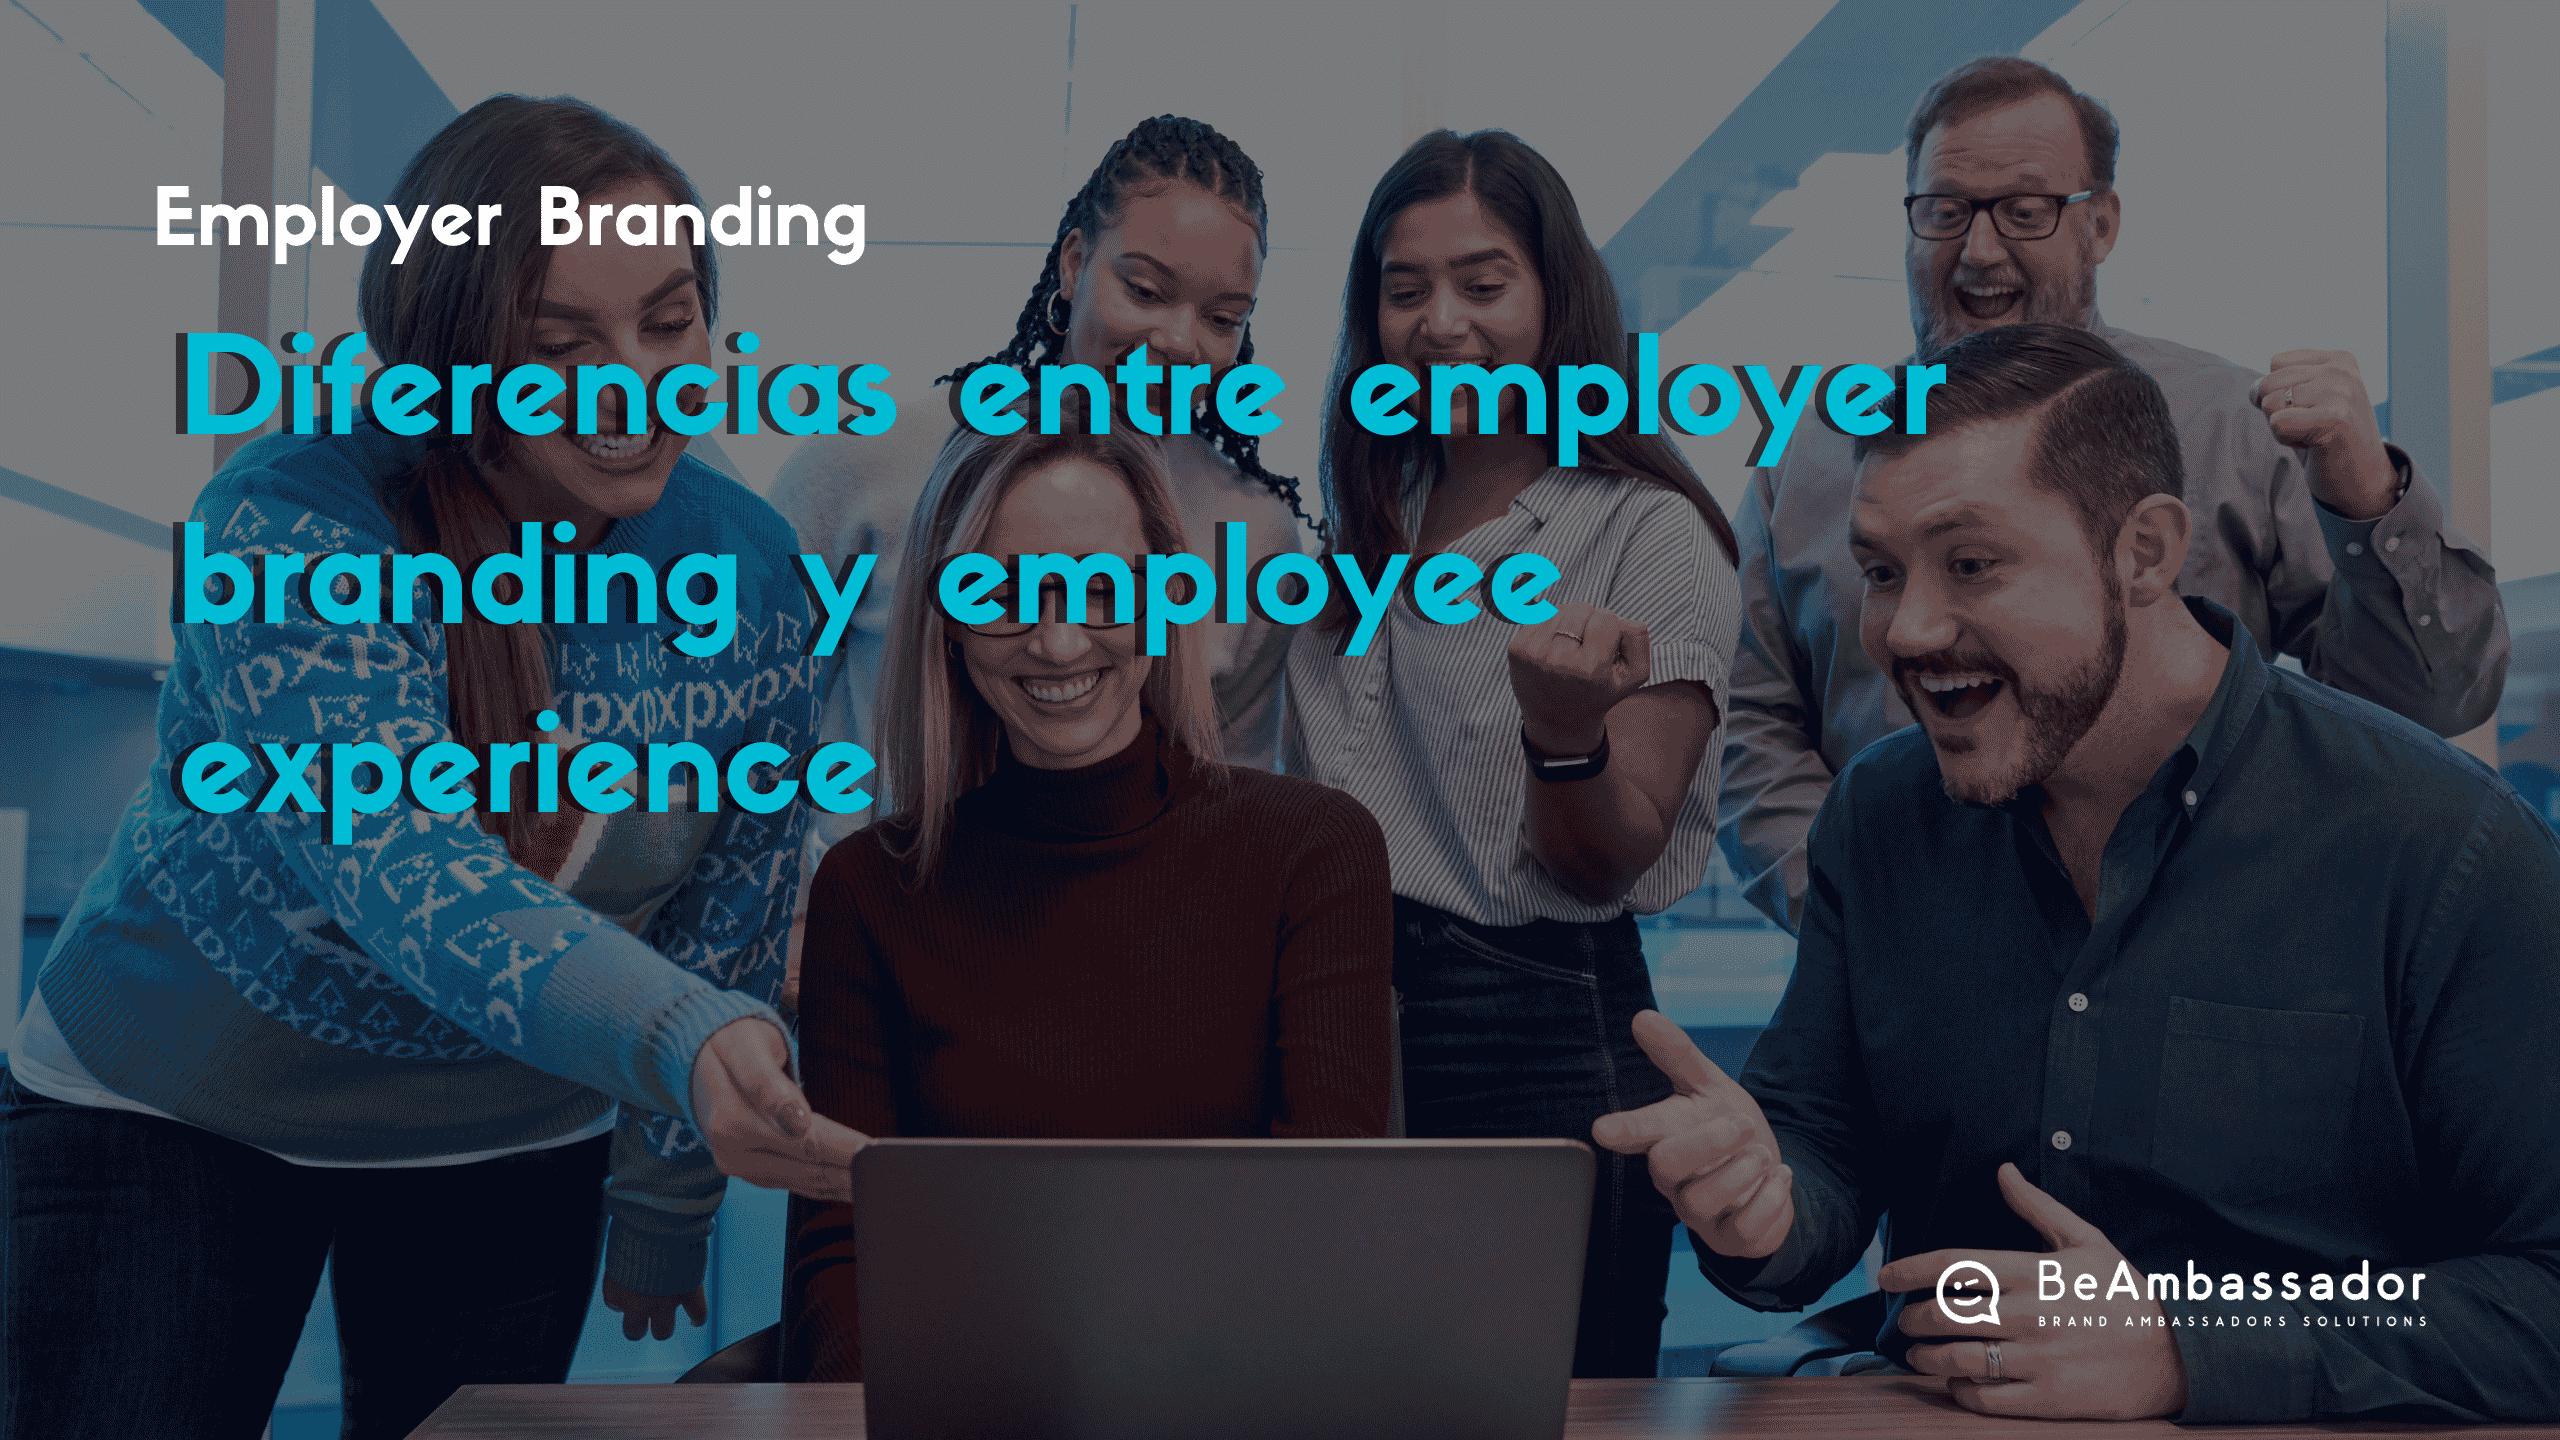 Diferencias employer branding y employee experience